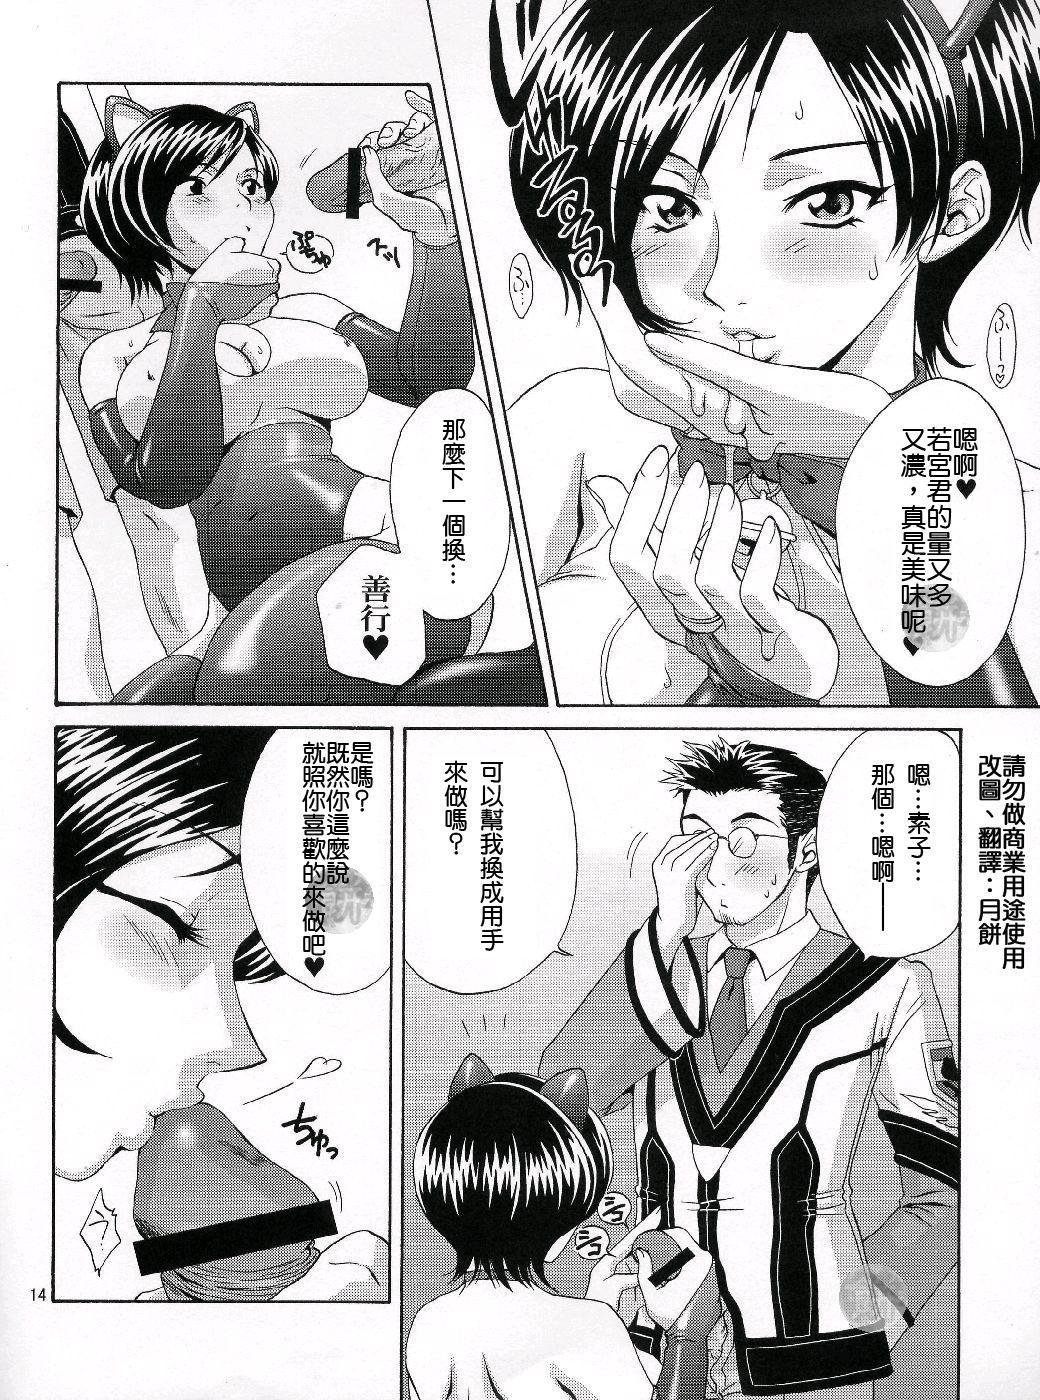 Hakudakueki Gensou Gang Bang March 12